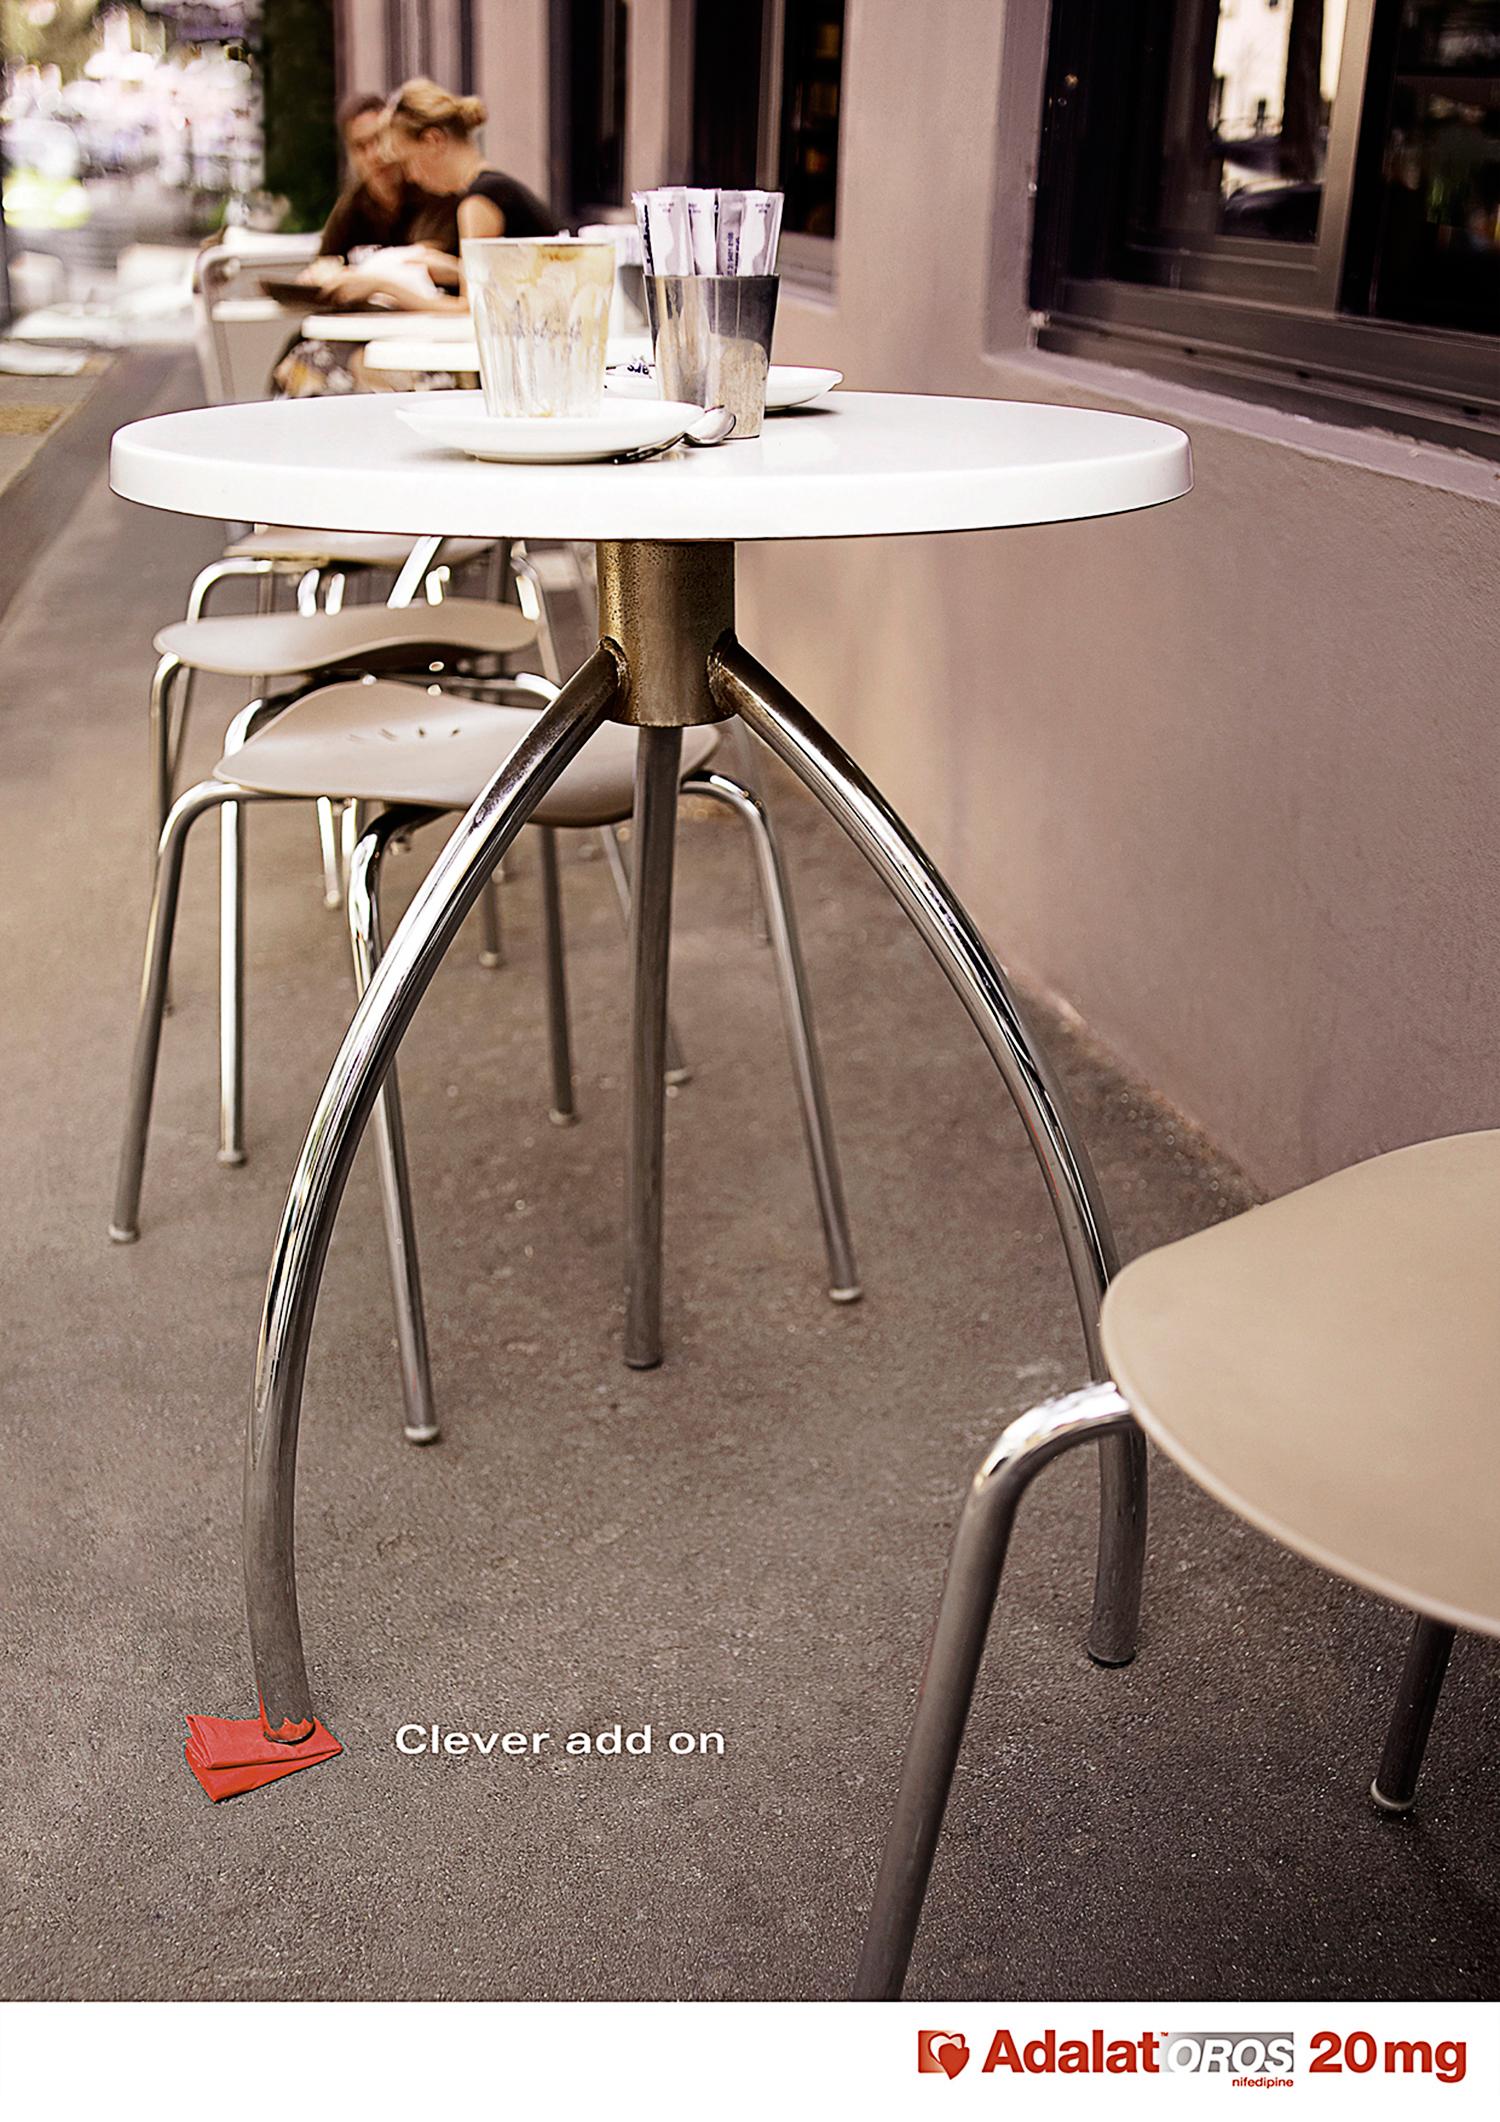 ADALAT-CAFE-TABLE-copy.jpg